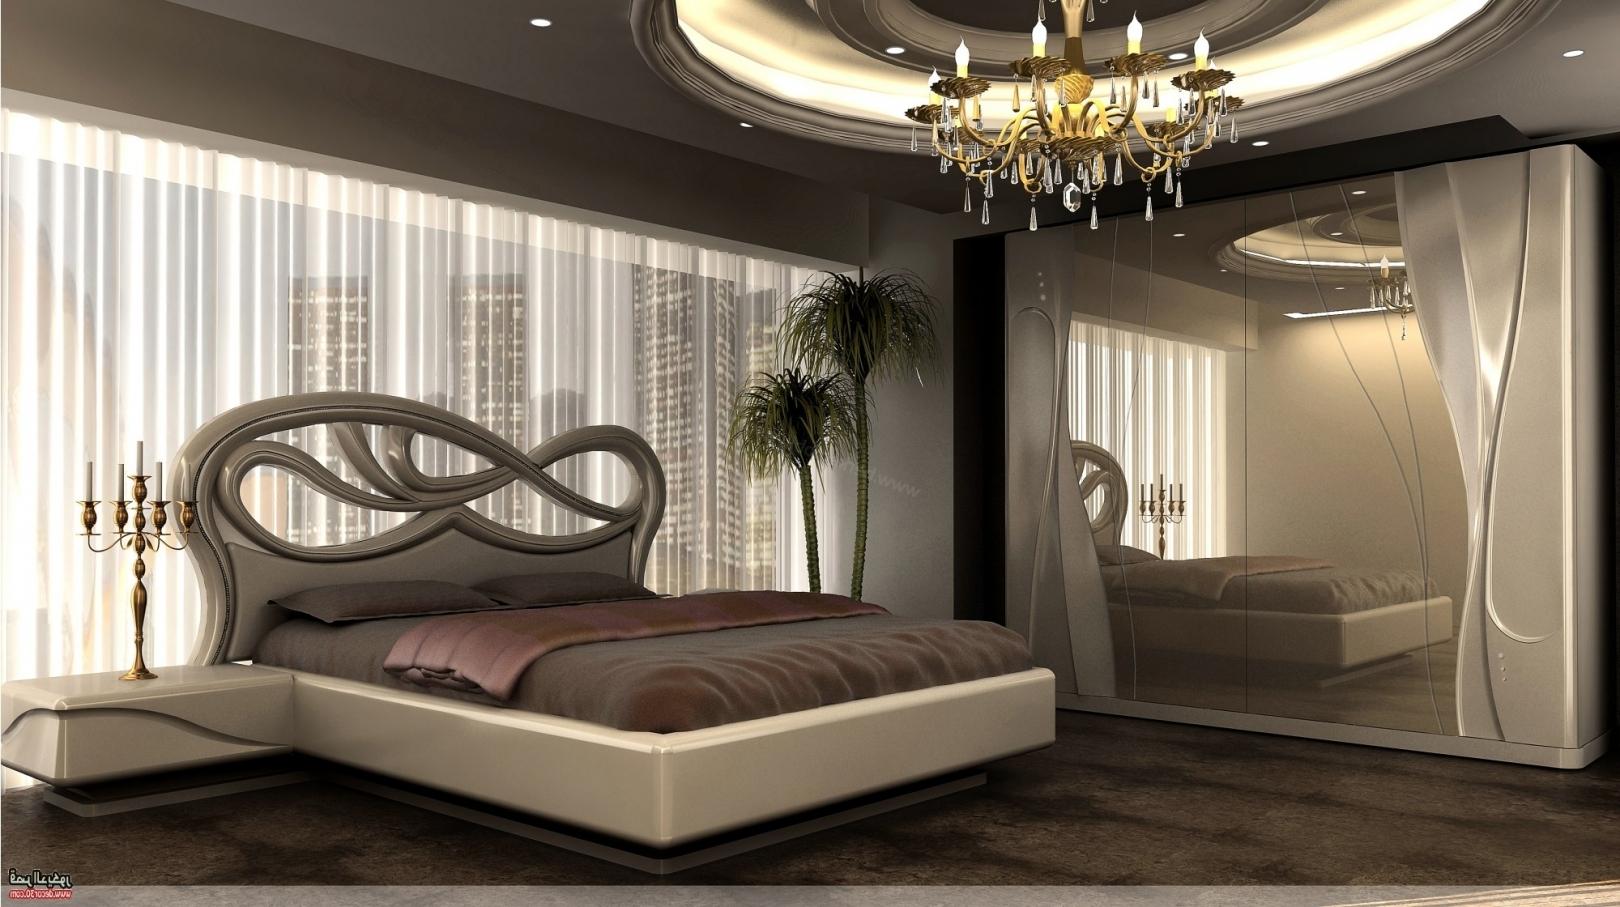 بالصور غرف نوم حديثه , احدث اشكال غرف النوم 3687 5